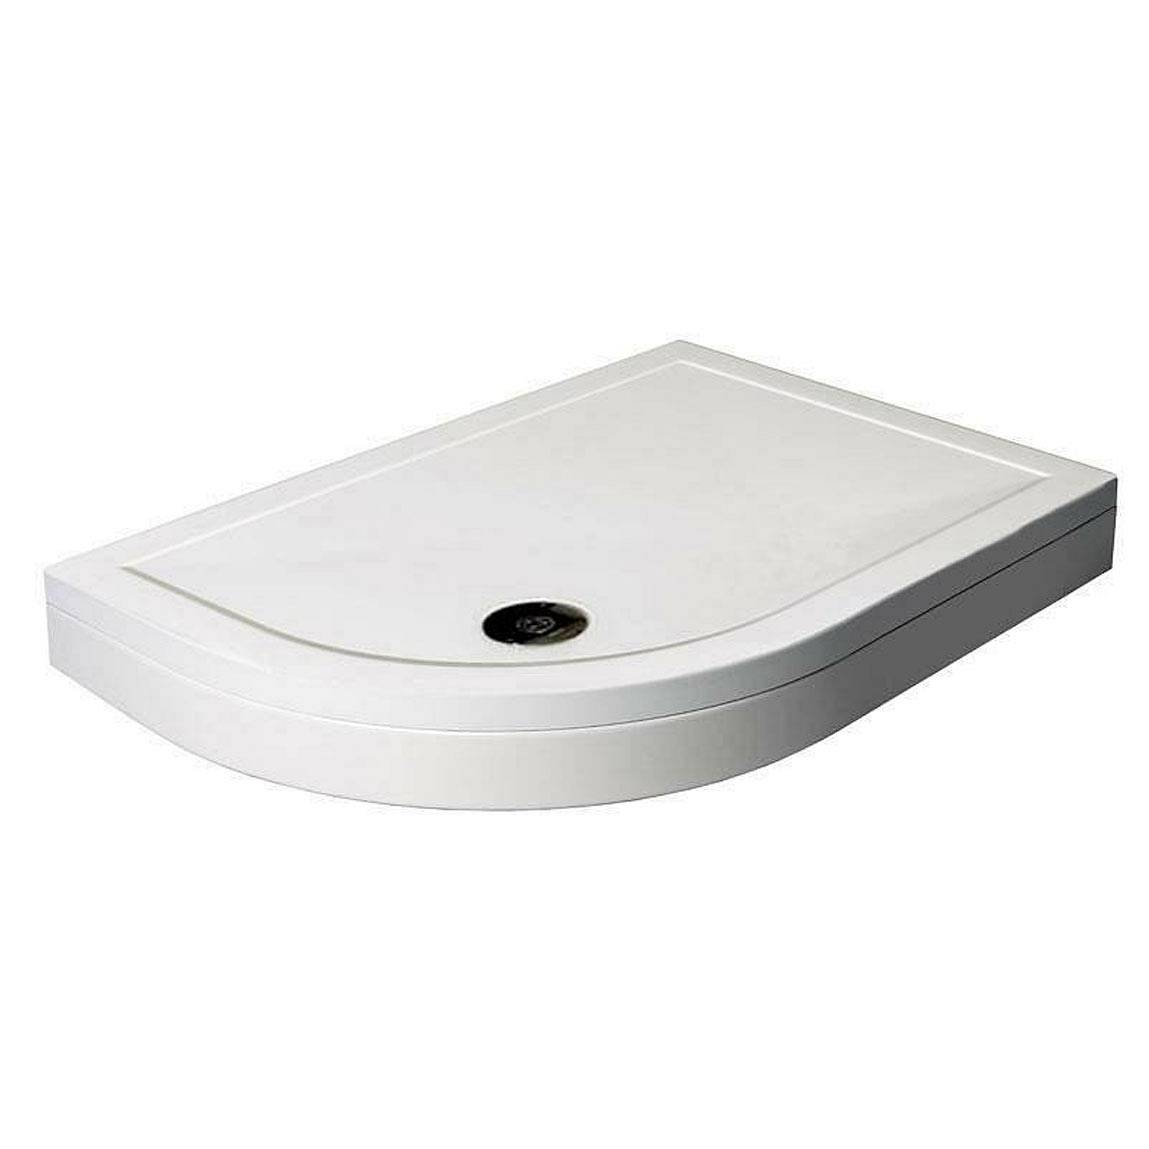 Image of Offset Quadrant Stone Shower Tray & Riser Kit 1200 x 900 LH